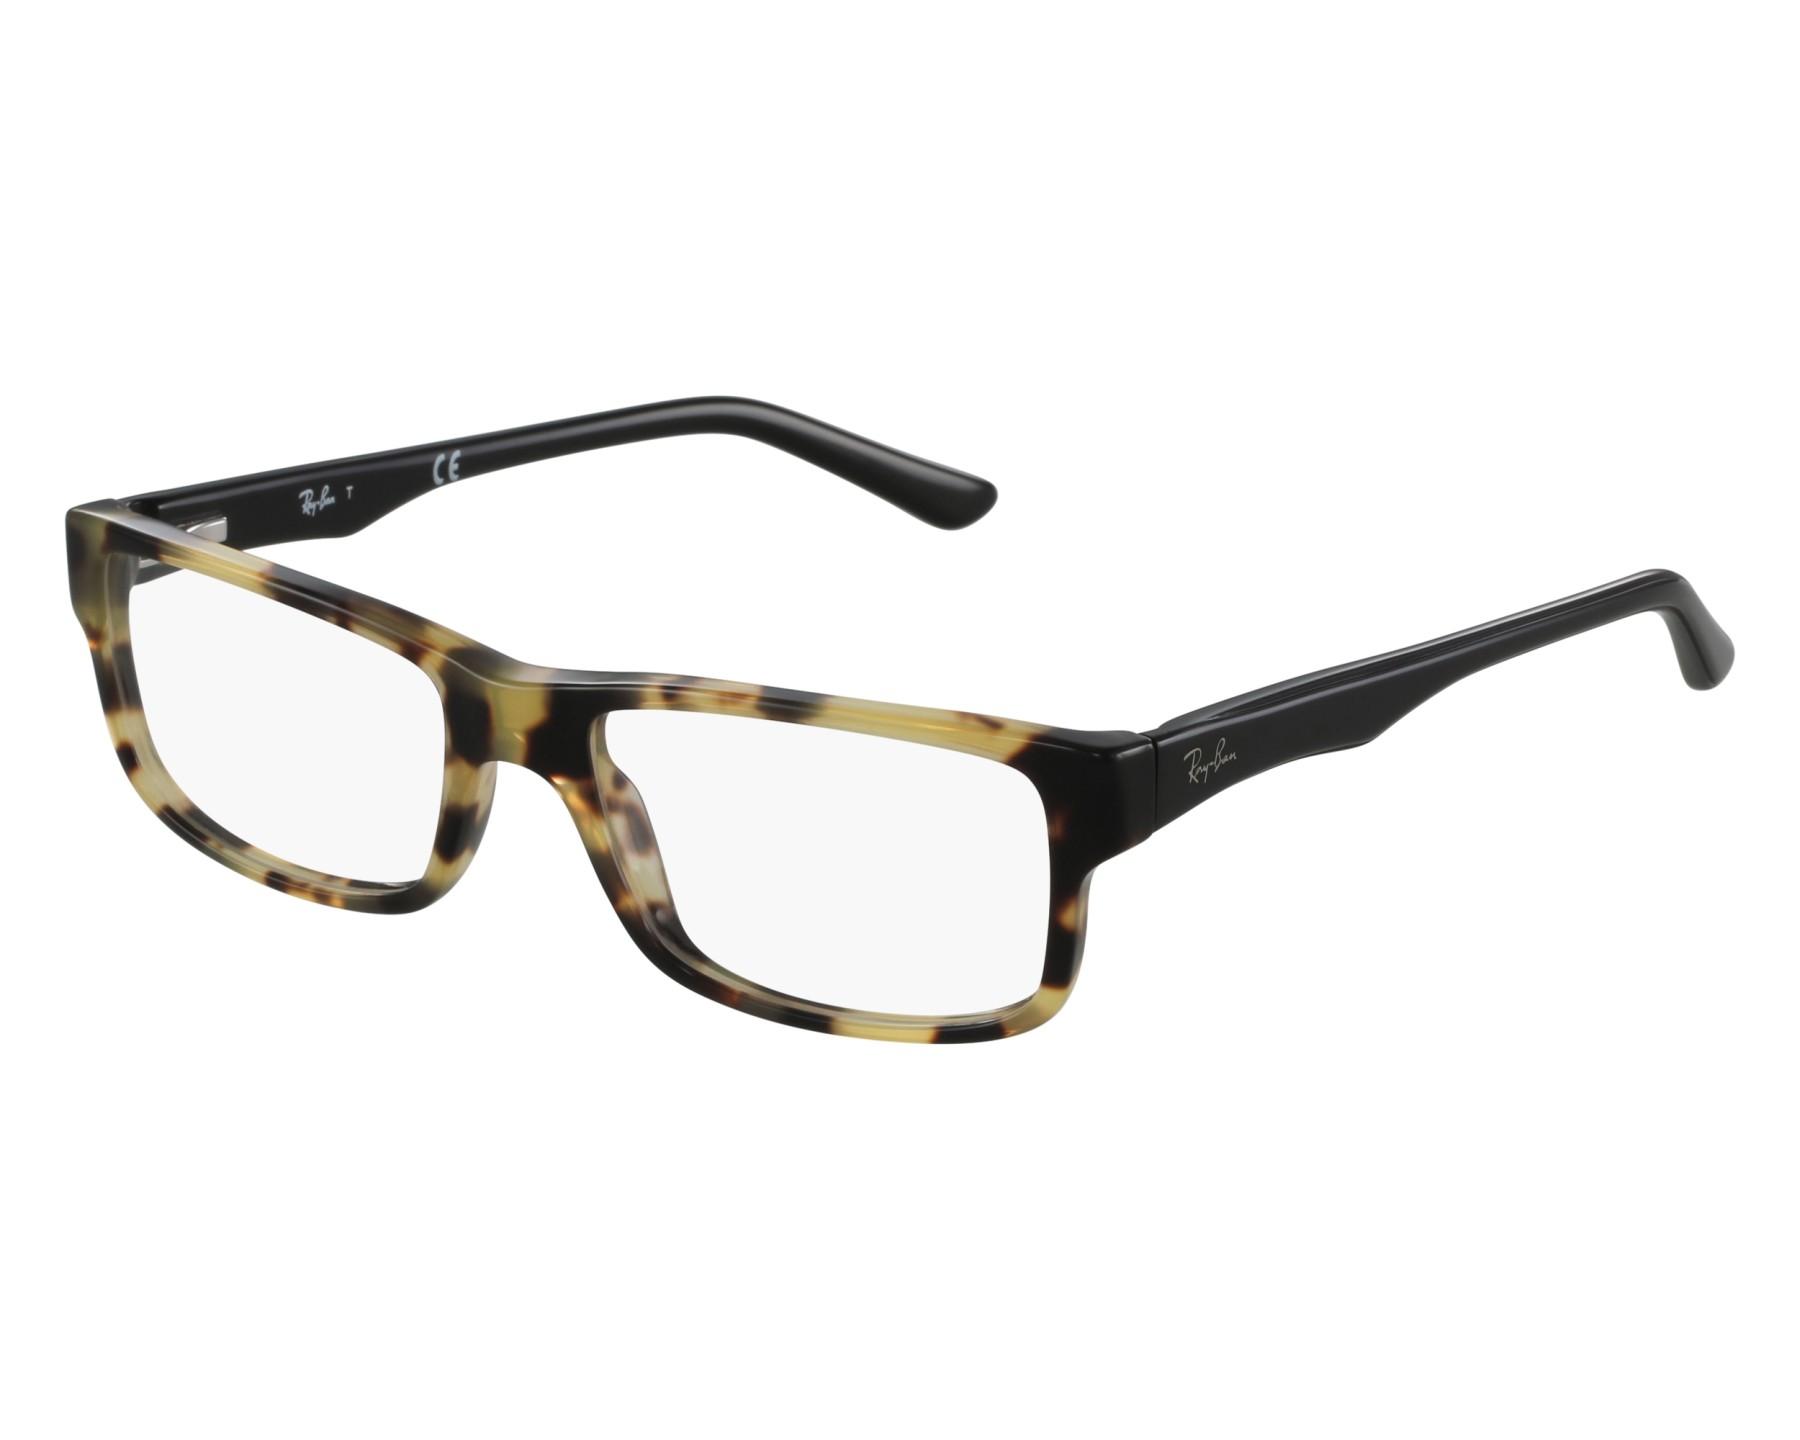 0608fd19cab eyeglasses Ray-Ban RX-5245 5608 52-17 Havana Black front view